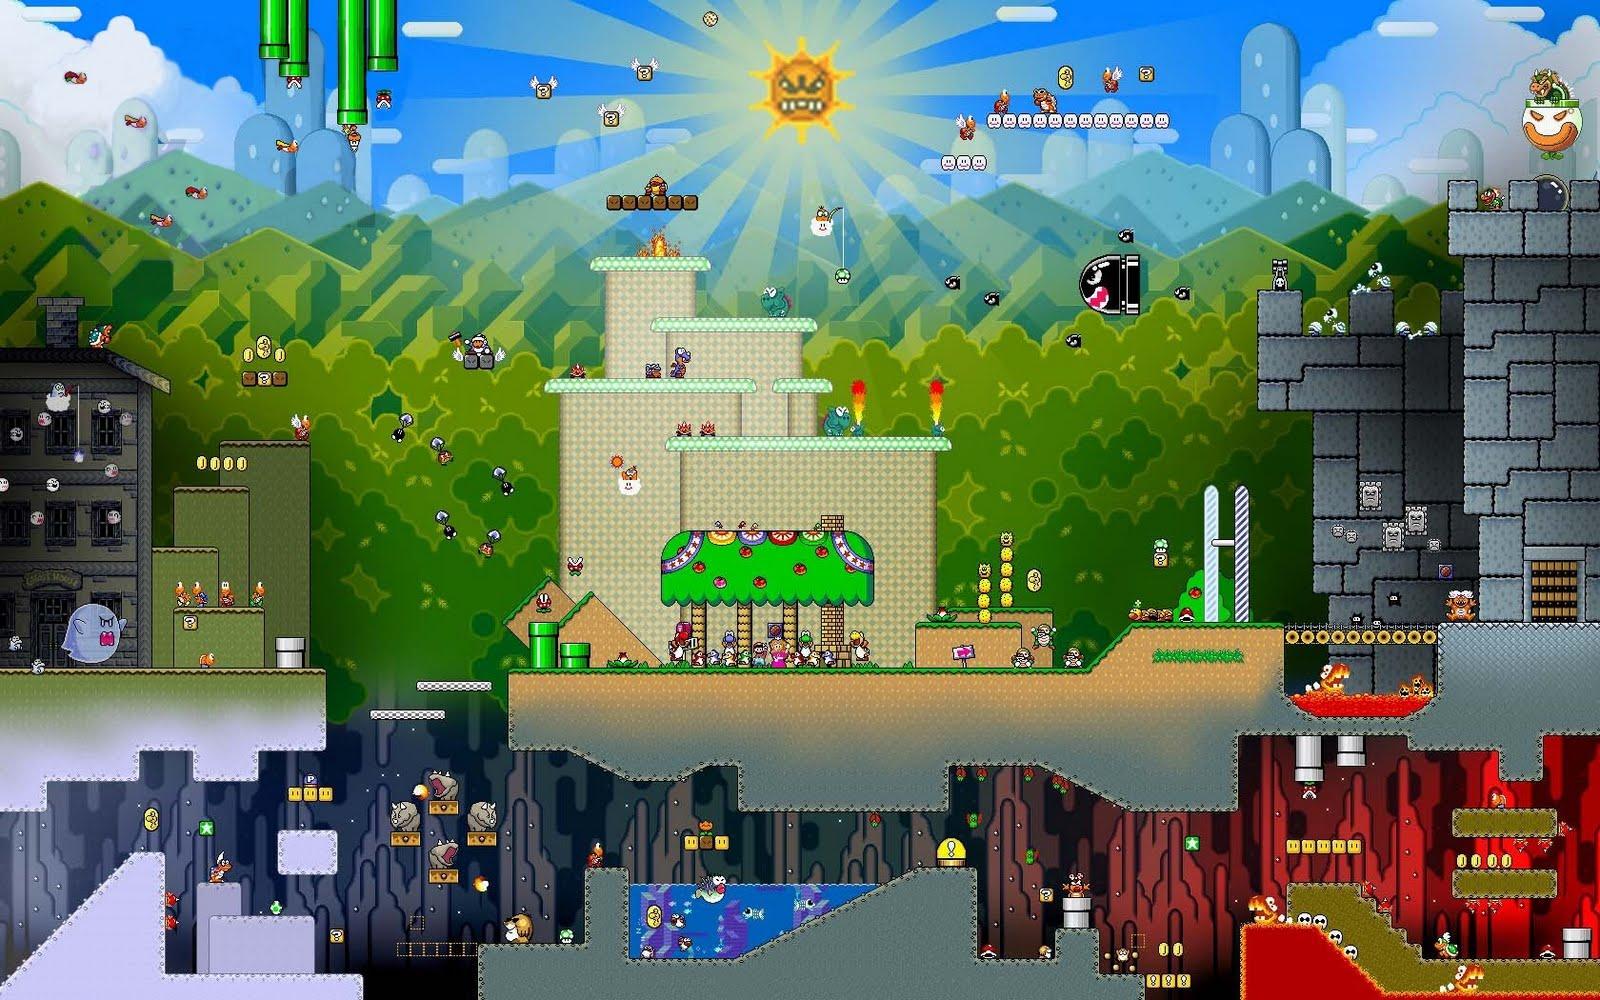 PK Gaming: Wallpaper Wednesday: Super Mario WORLD